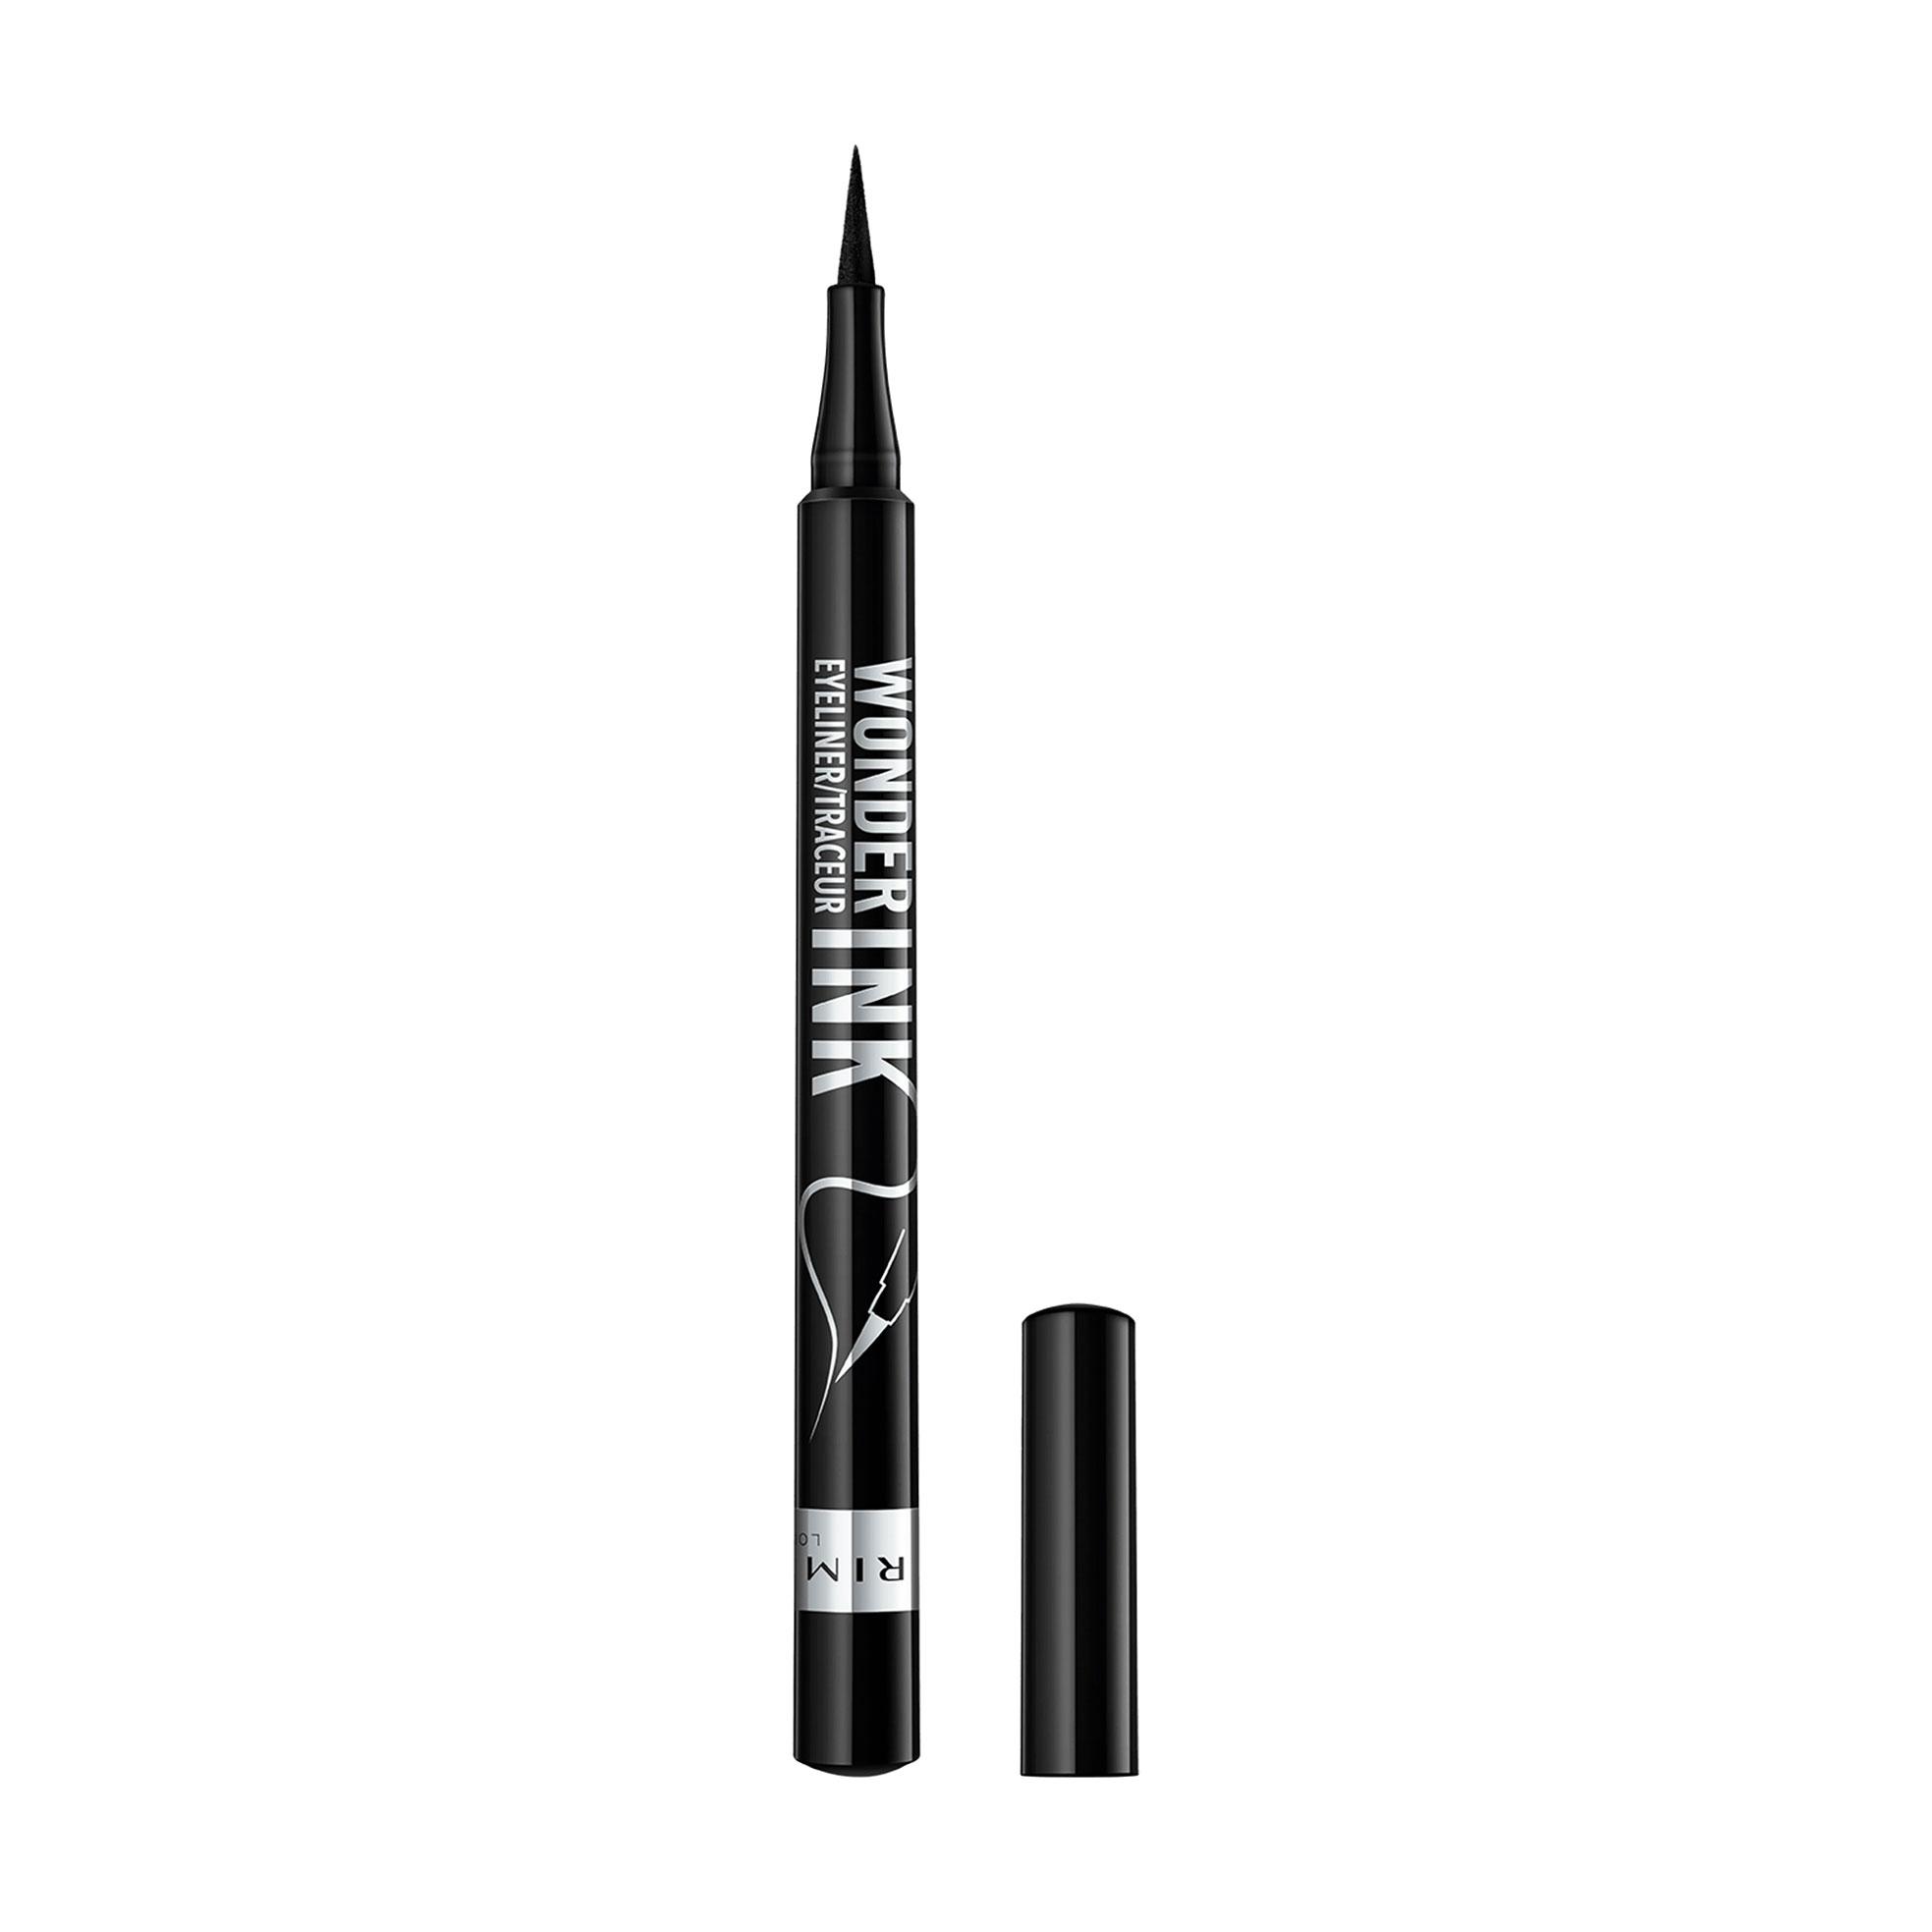 Rimmel / Підводка для очей RM WONDER INK EYELINER 01 Black